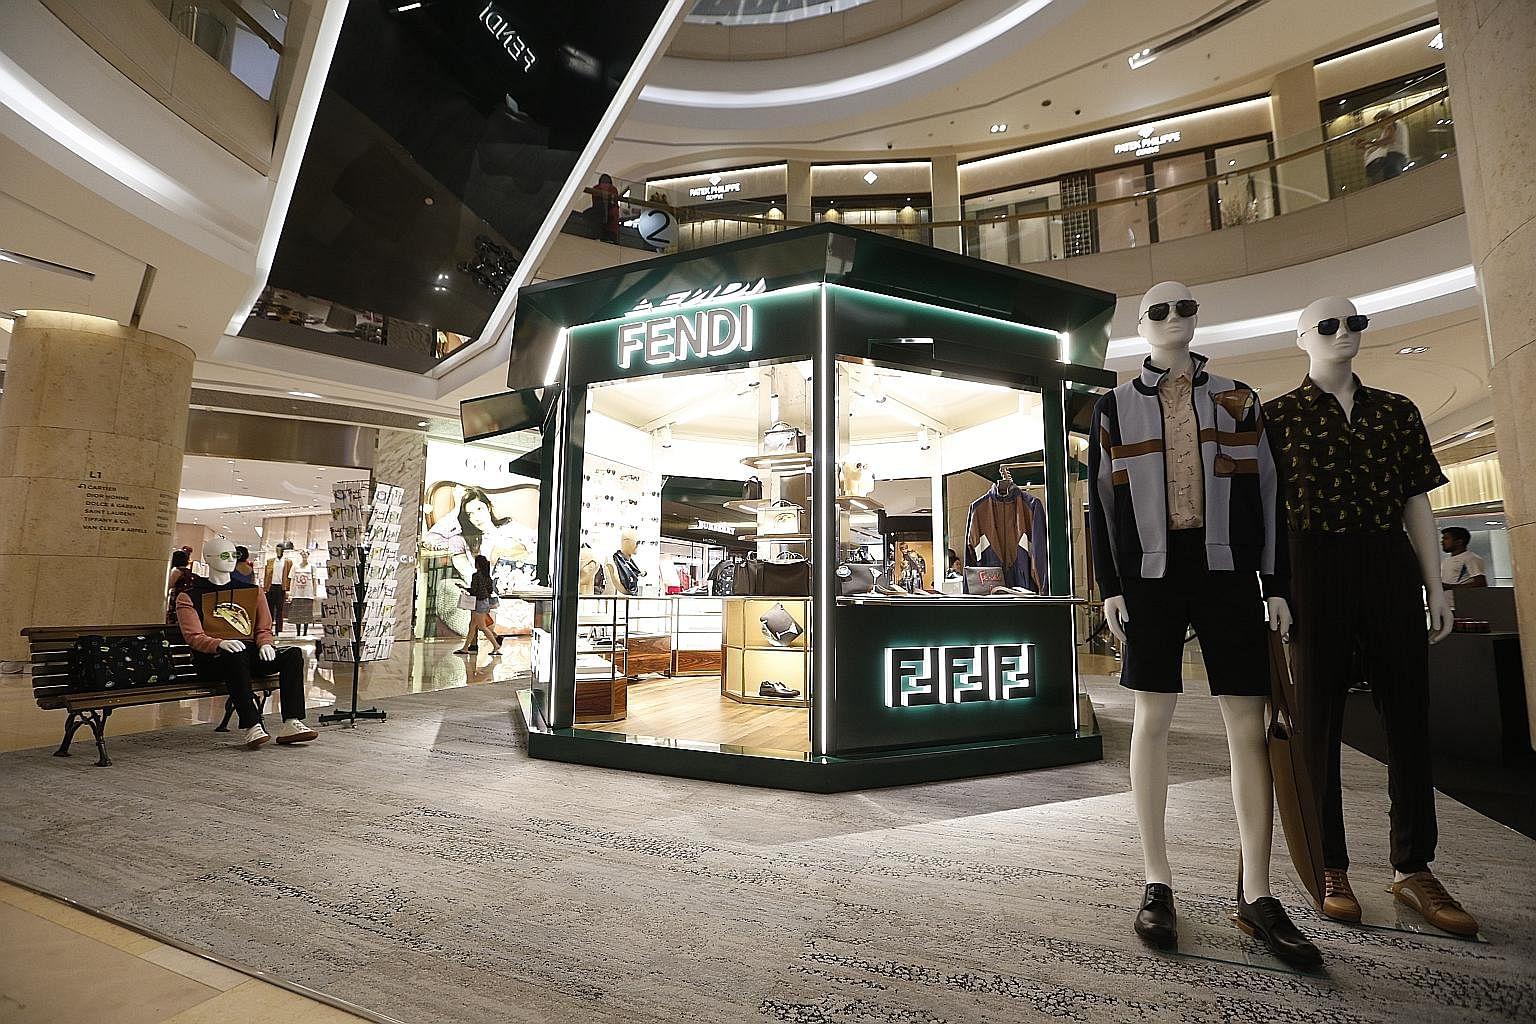 8934b29510 Pop-up kiosk celebrates opening of Fendi s fourth store here ...